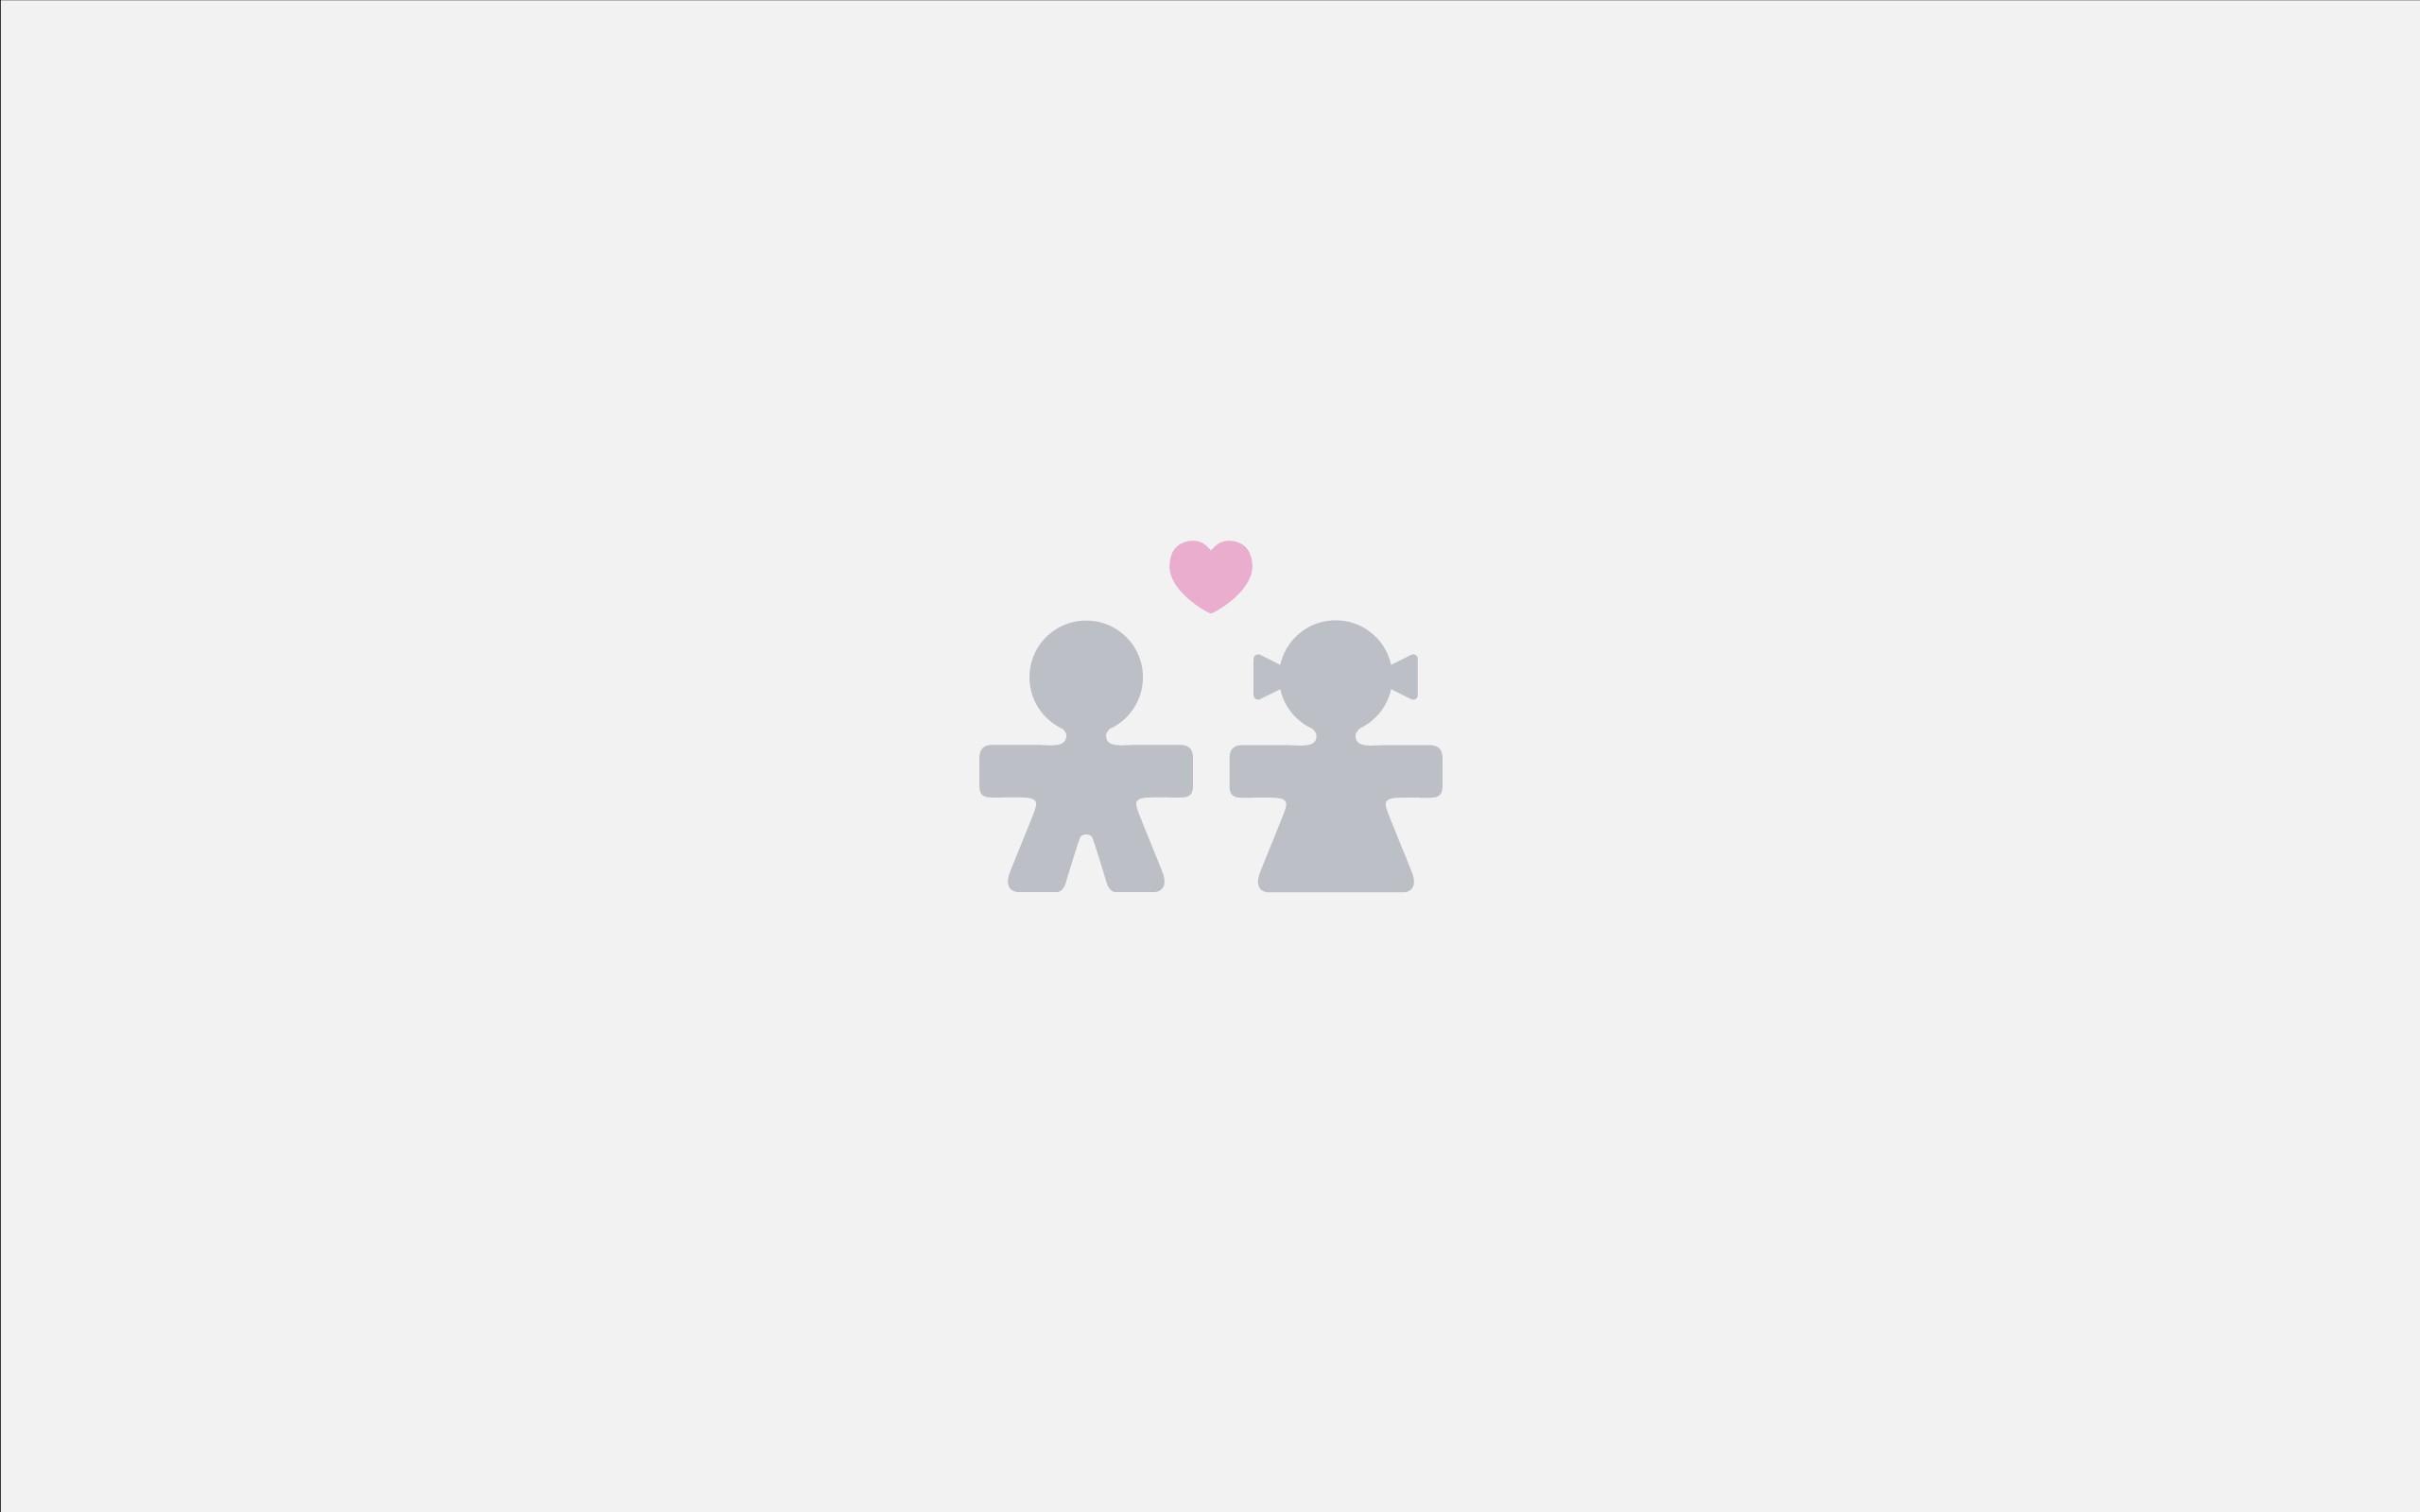 Hearth Love Vector Wallpaper 004